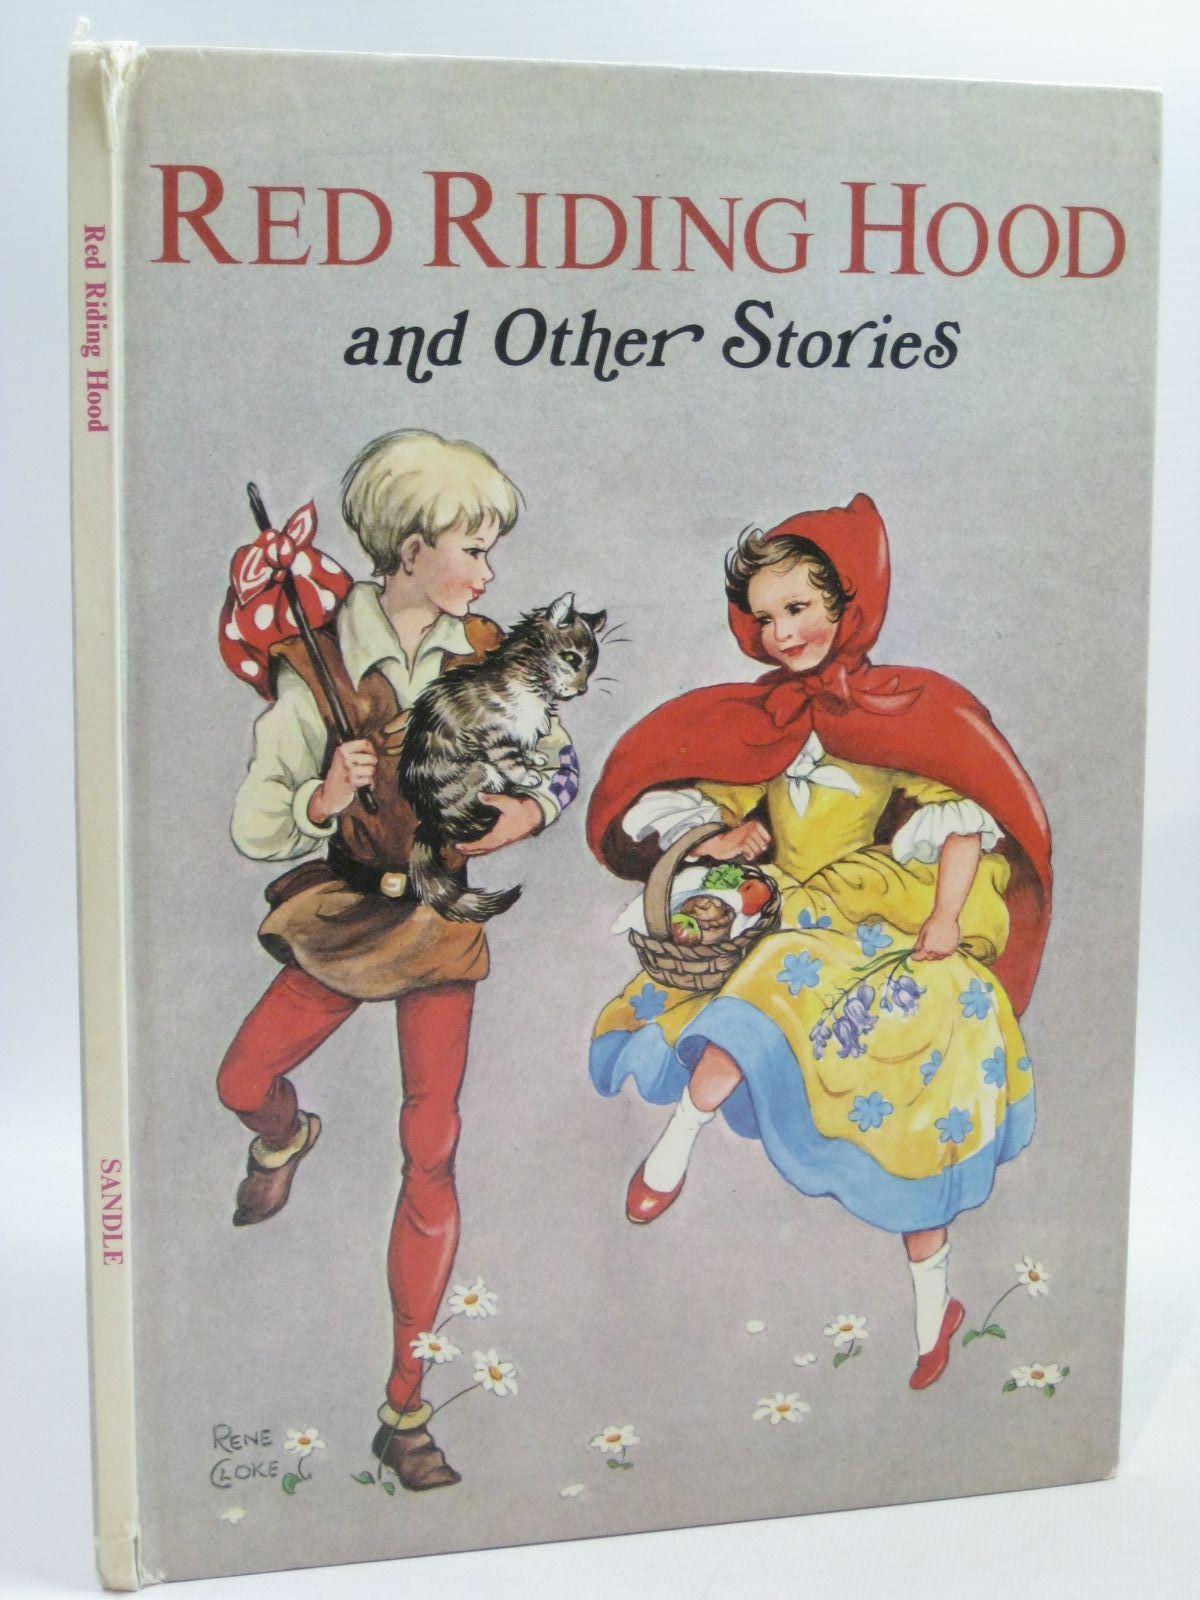 little red riding hood stock code 1401426 stella rose 39 s books. Black Bedroom Furniture Sets. Home Design Ideas